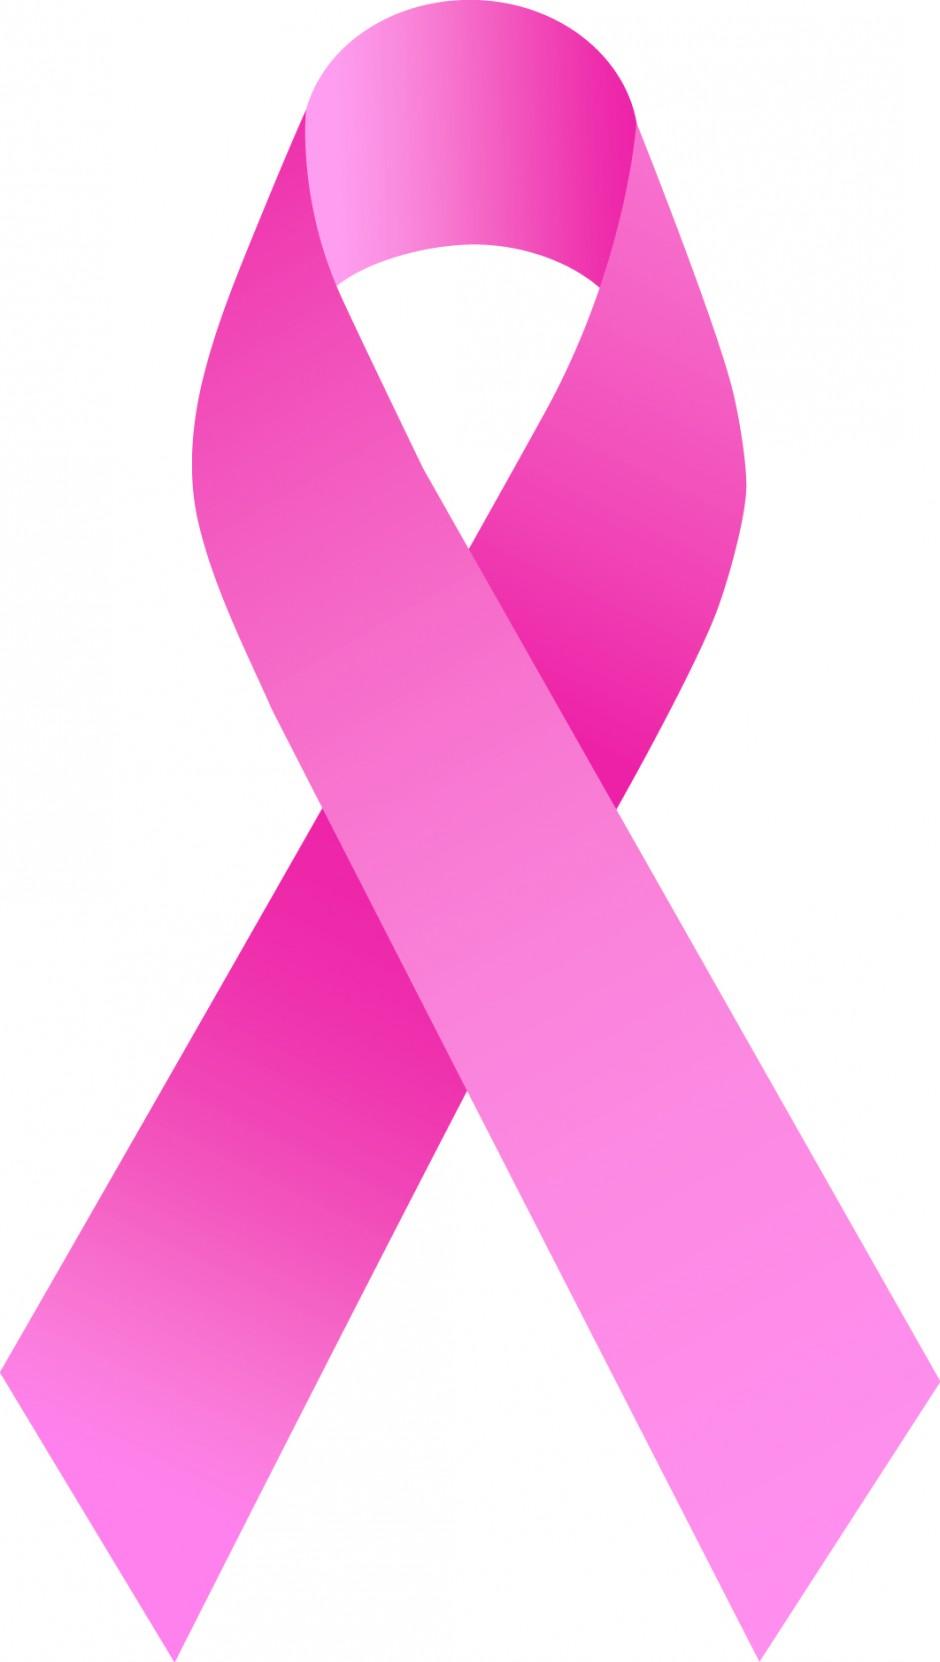 Awareness Ribbon Template.